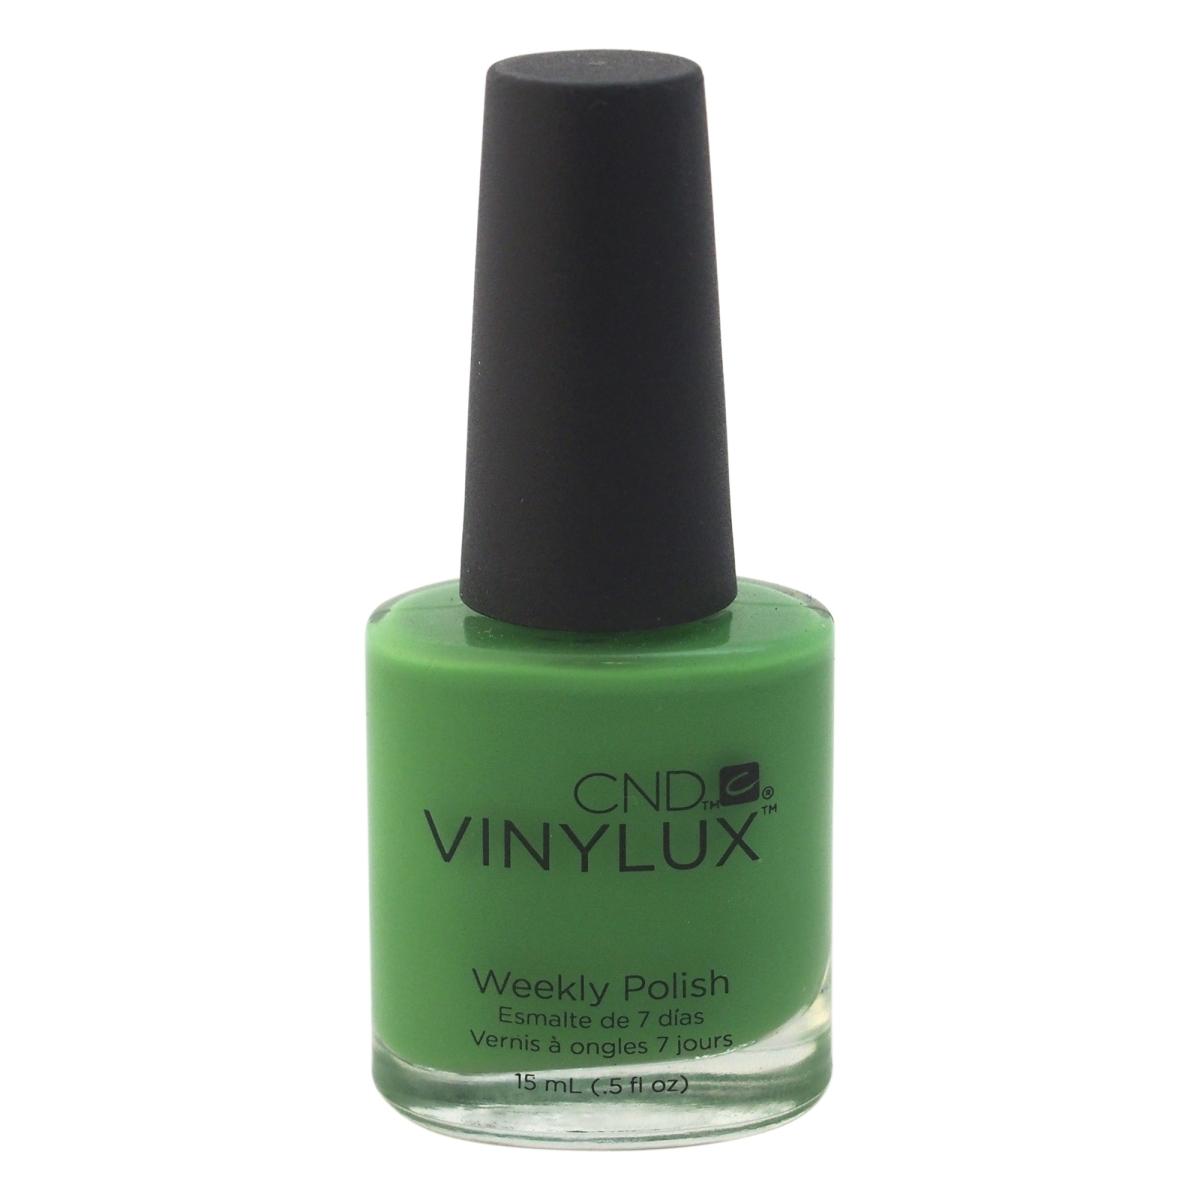 CND W-C-5861 Vinylux Weekly Polish at 170 Lush Tropics Nail Polish for Women - 0.5 oz